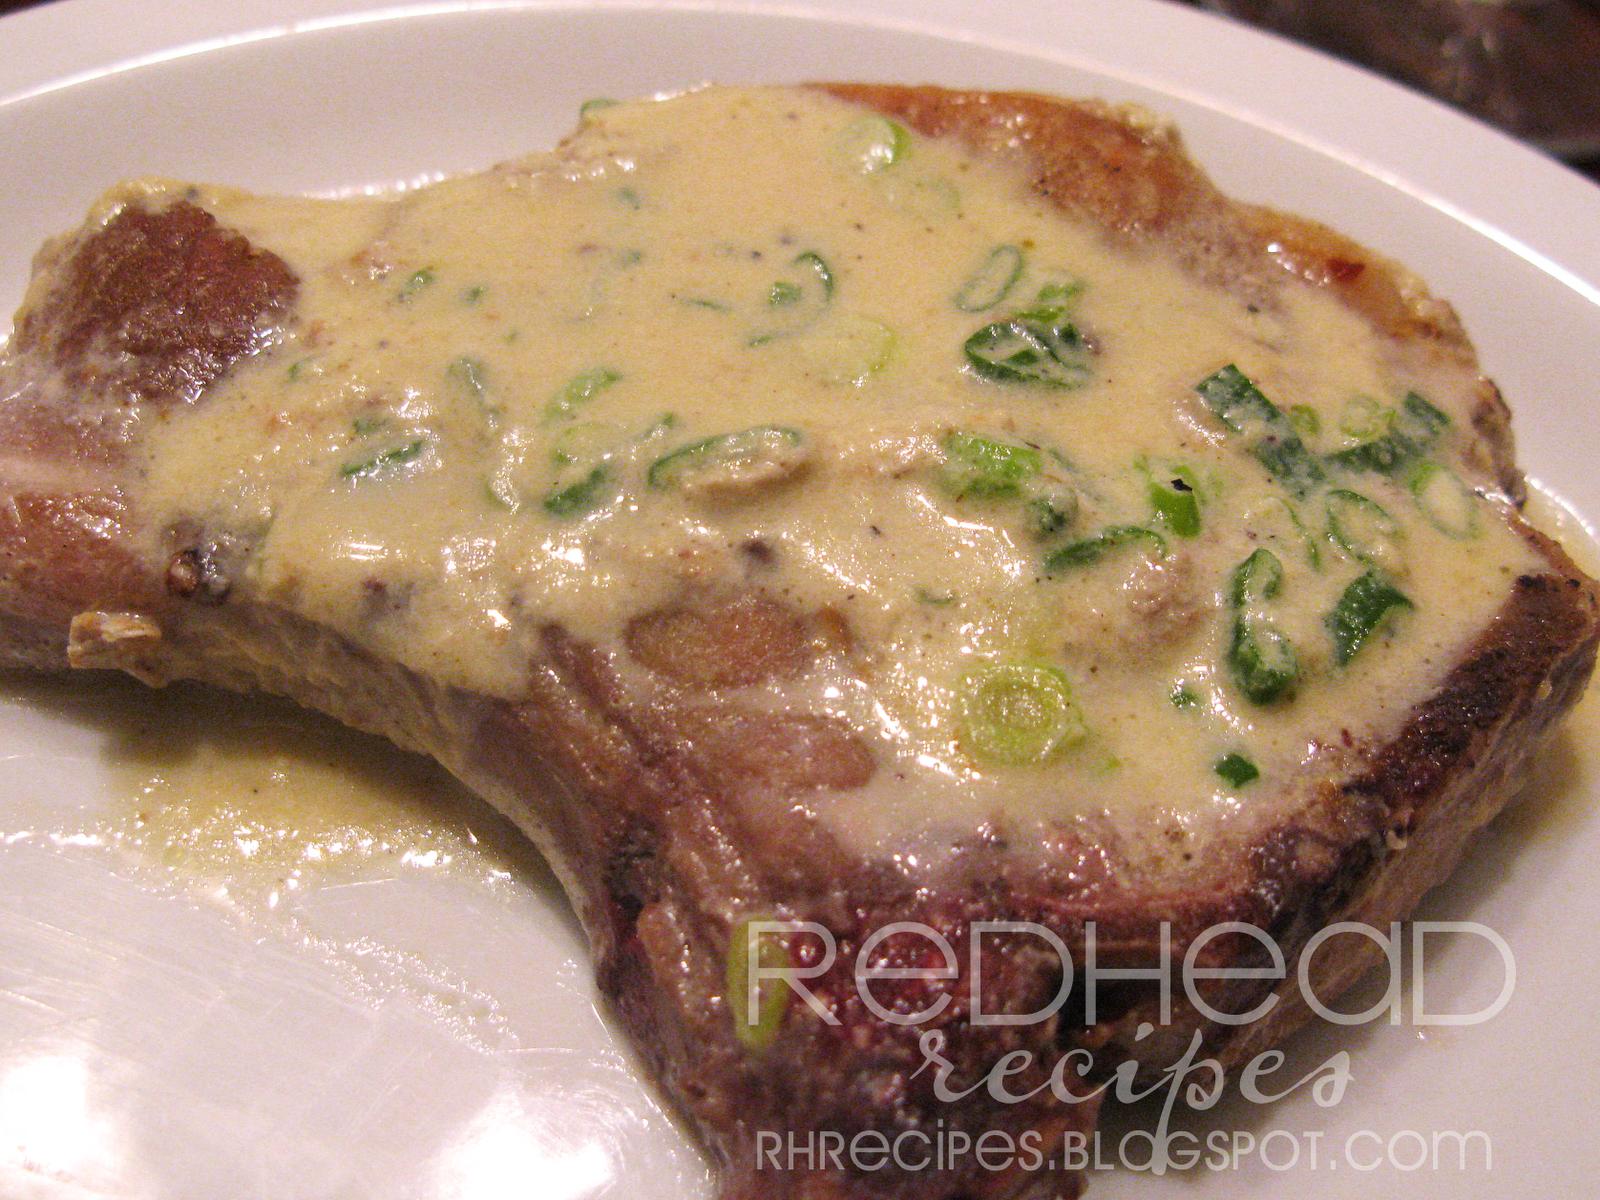 Redhead Recipes: Mustard Pork Chops